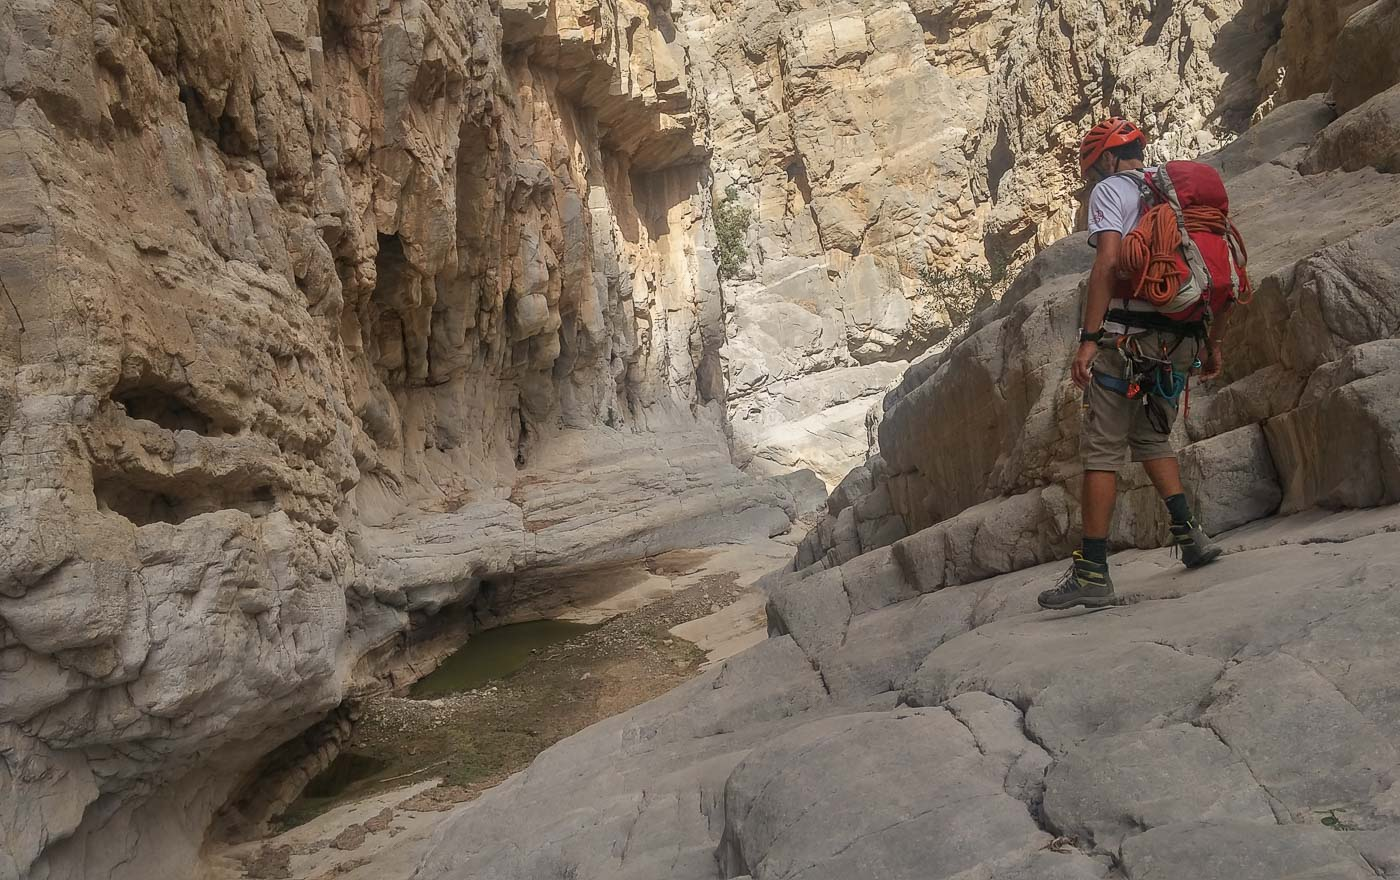 Gorges du Kirithon, Ras Al Khaimah 29